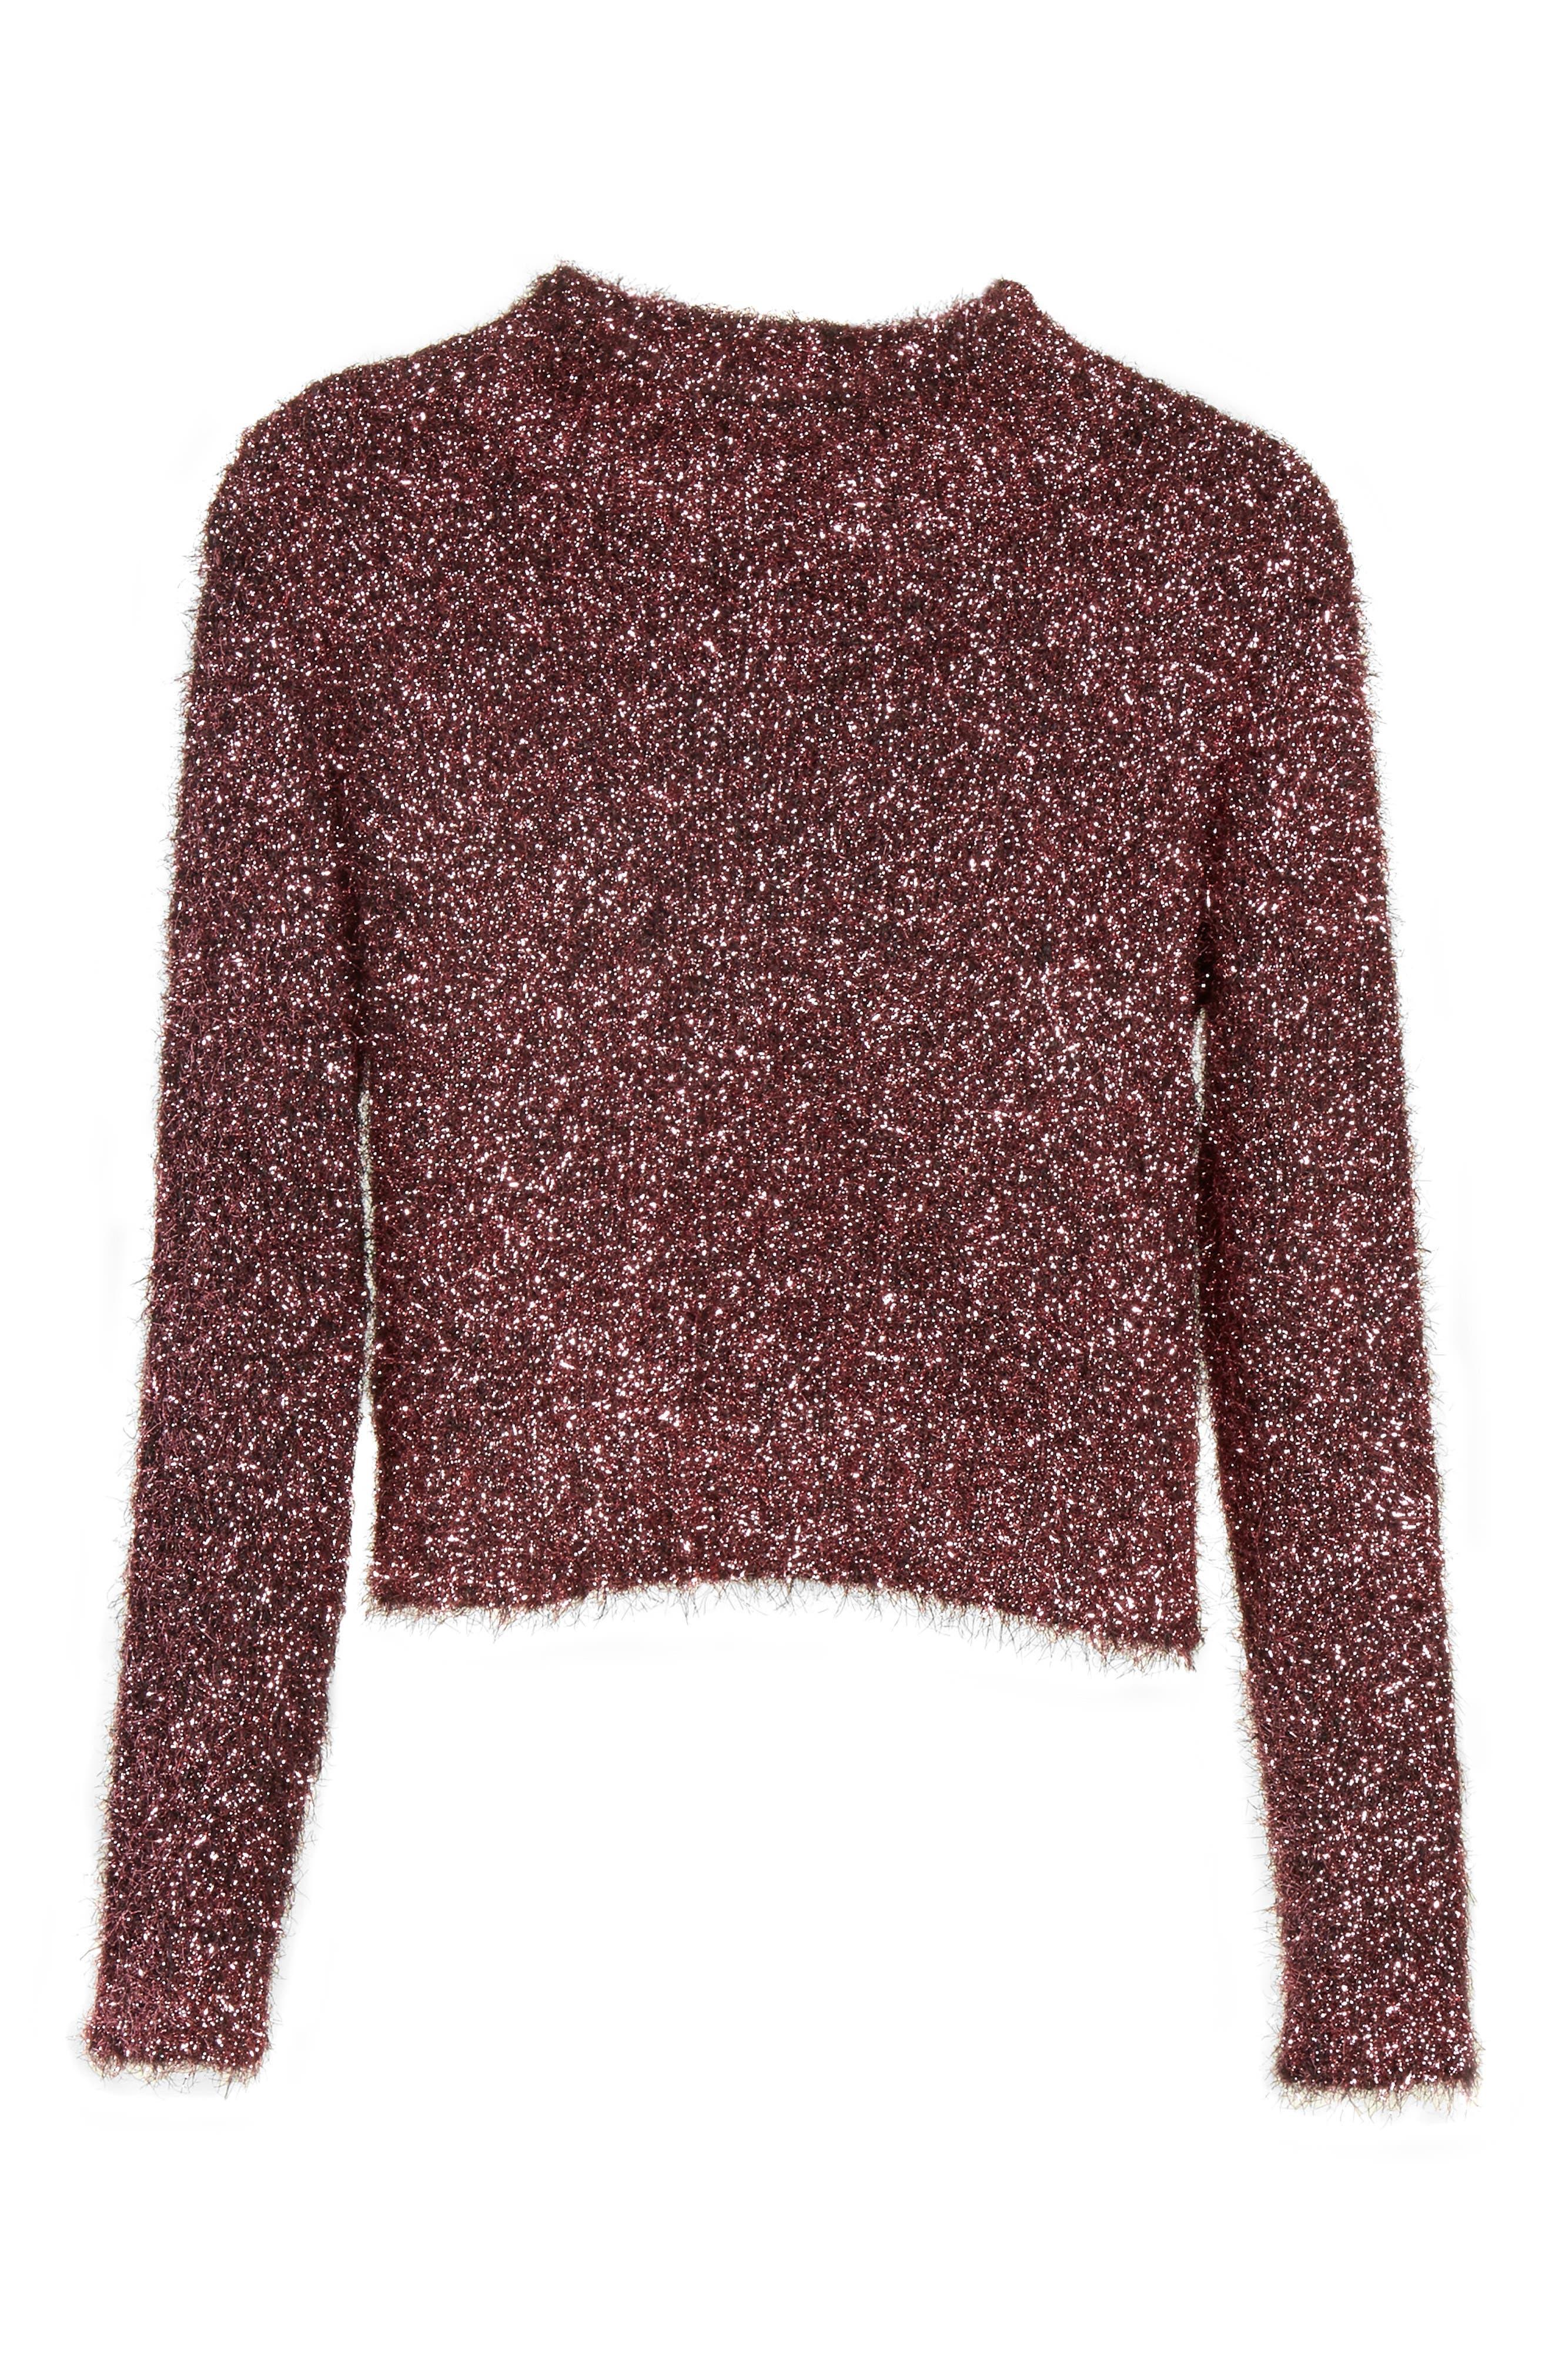 Vaporize Textured Metallic Sweater,                             Alternate thumbnail 6, color,                             650